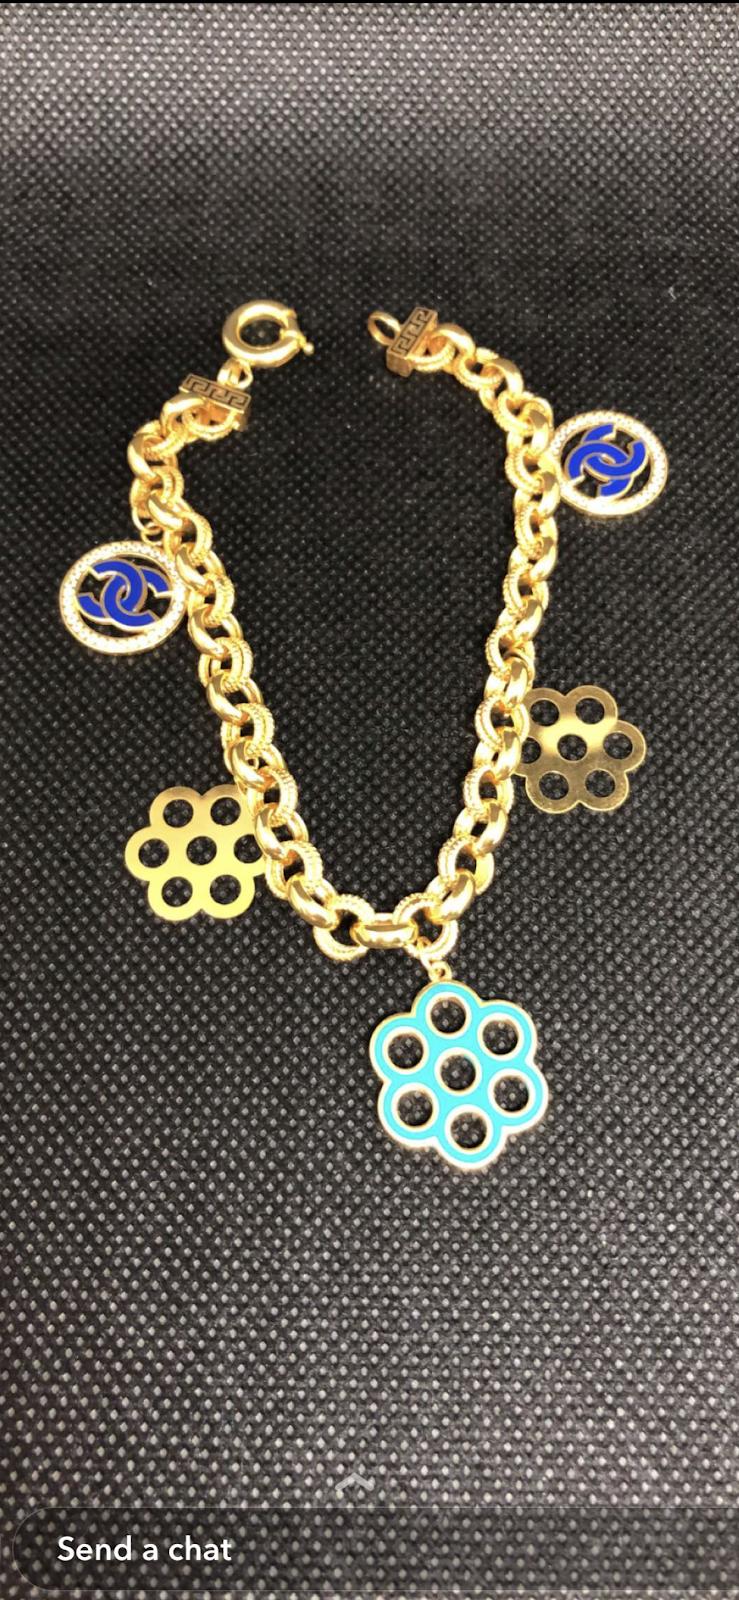 Queen jewelry - jewelry store  | Photo 4 of 10 | Address: 4064 E 14 Mile Rd, Warren, MI 48092, USA | Phone: (586) 303-2991